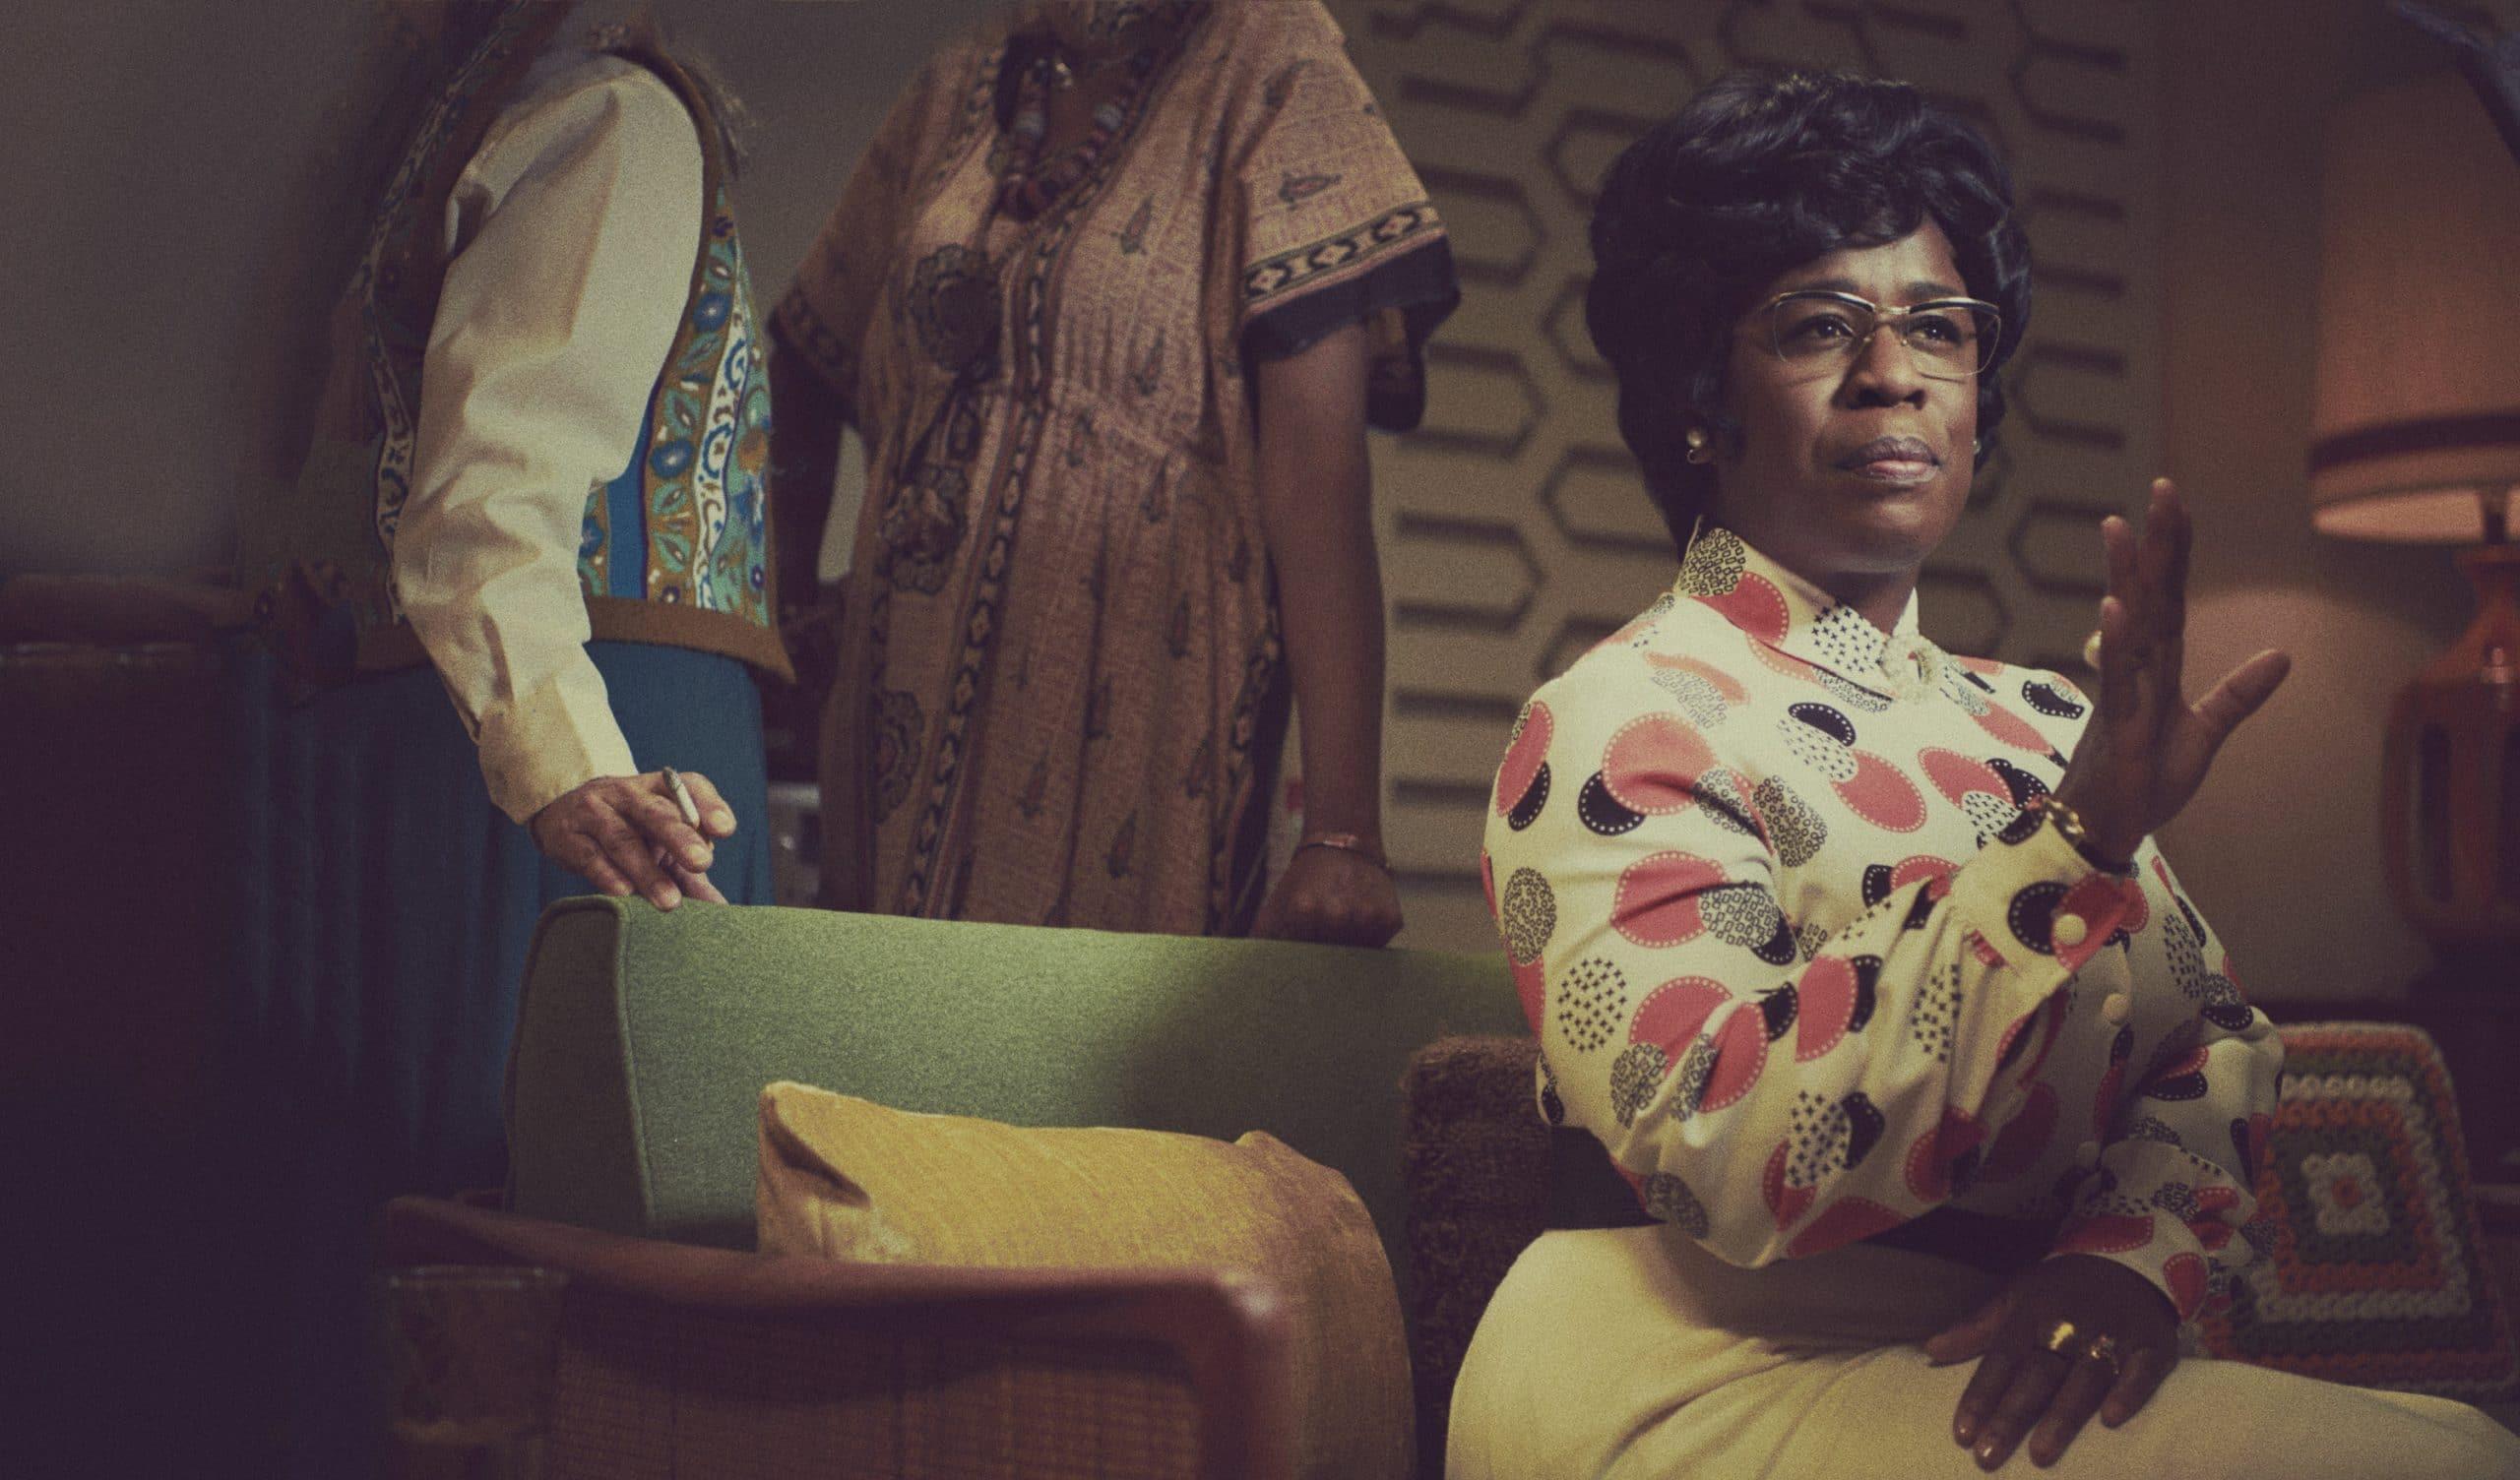 Uzo Aduba Wins Emmy for Mrs. America